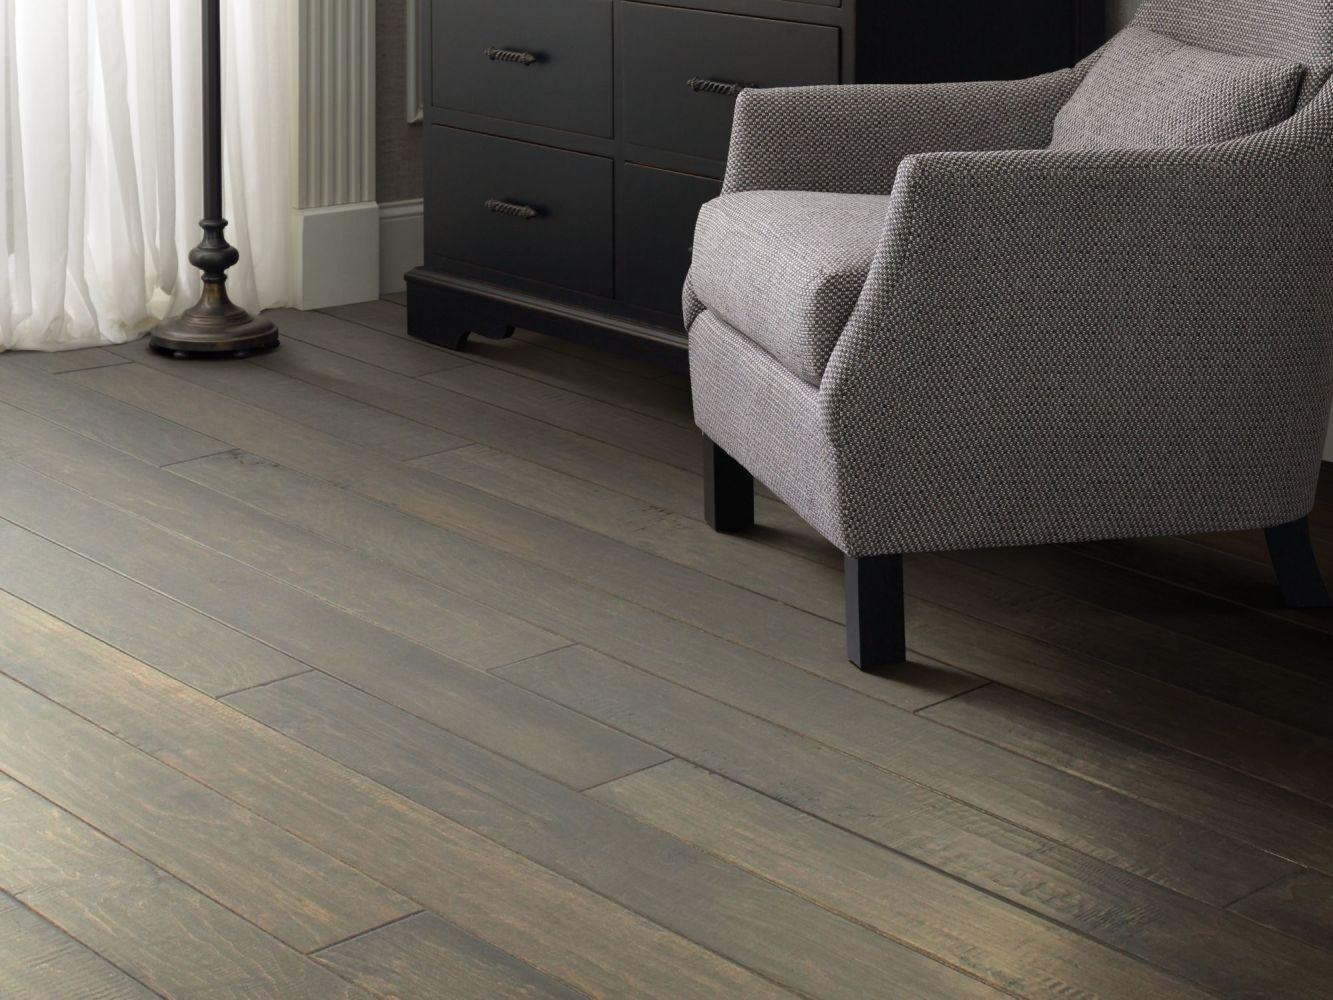 Anderson Tuftex Floors To Go Hardwood Walton Maple Varuna 19001_FW668